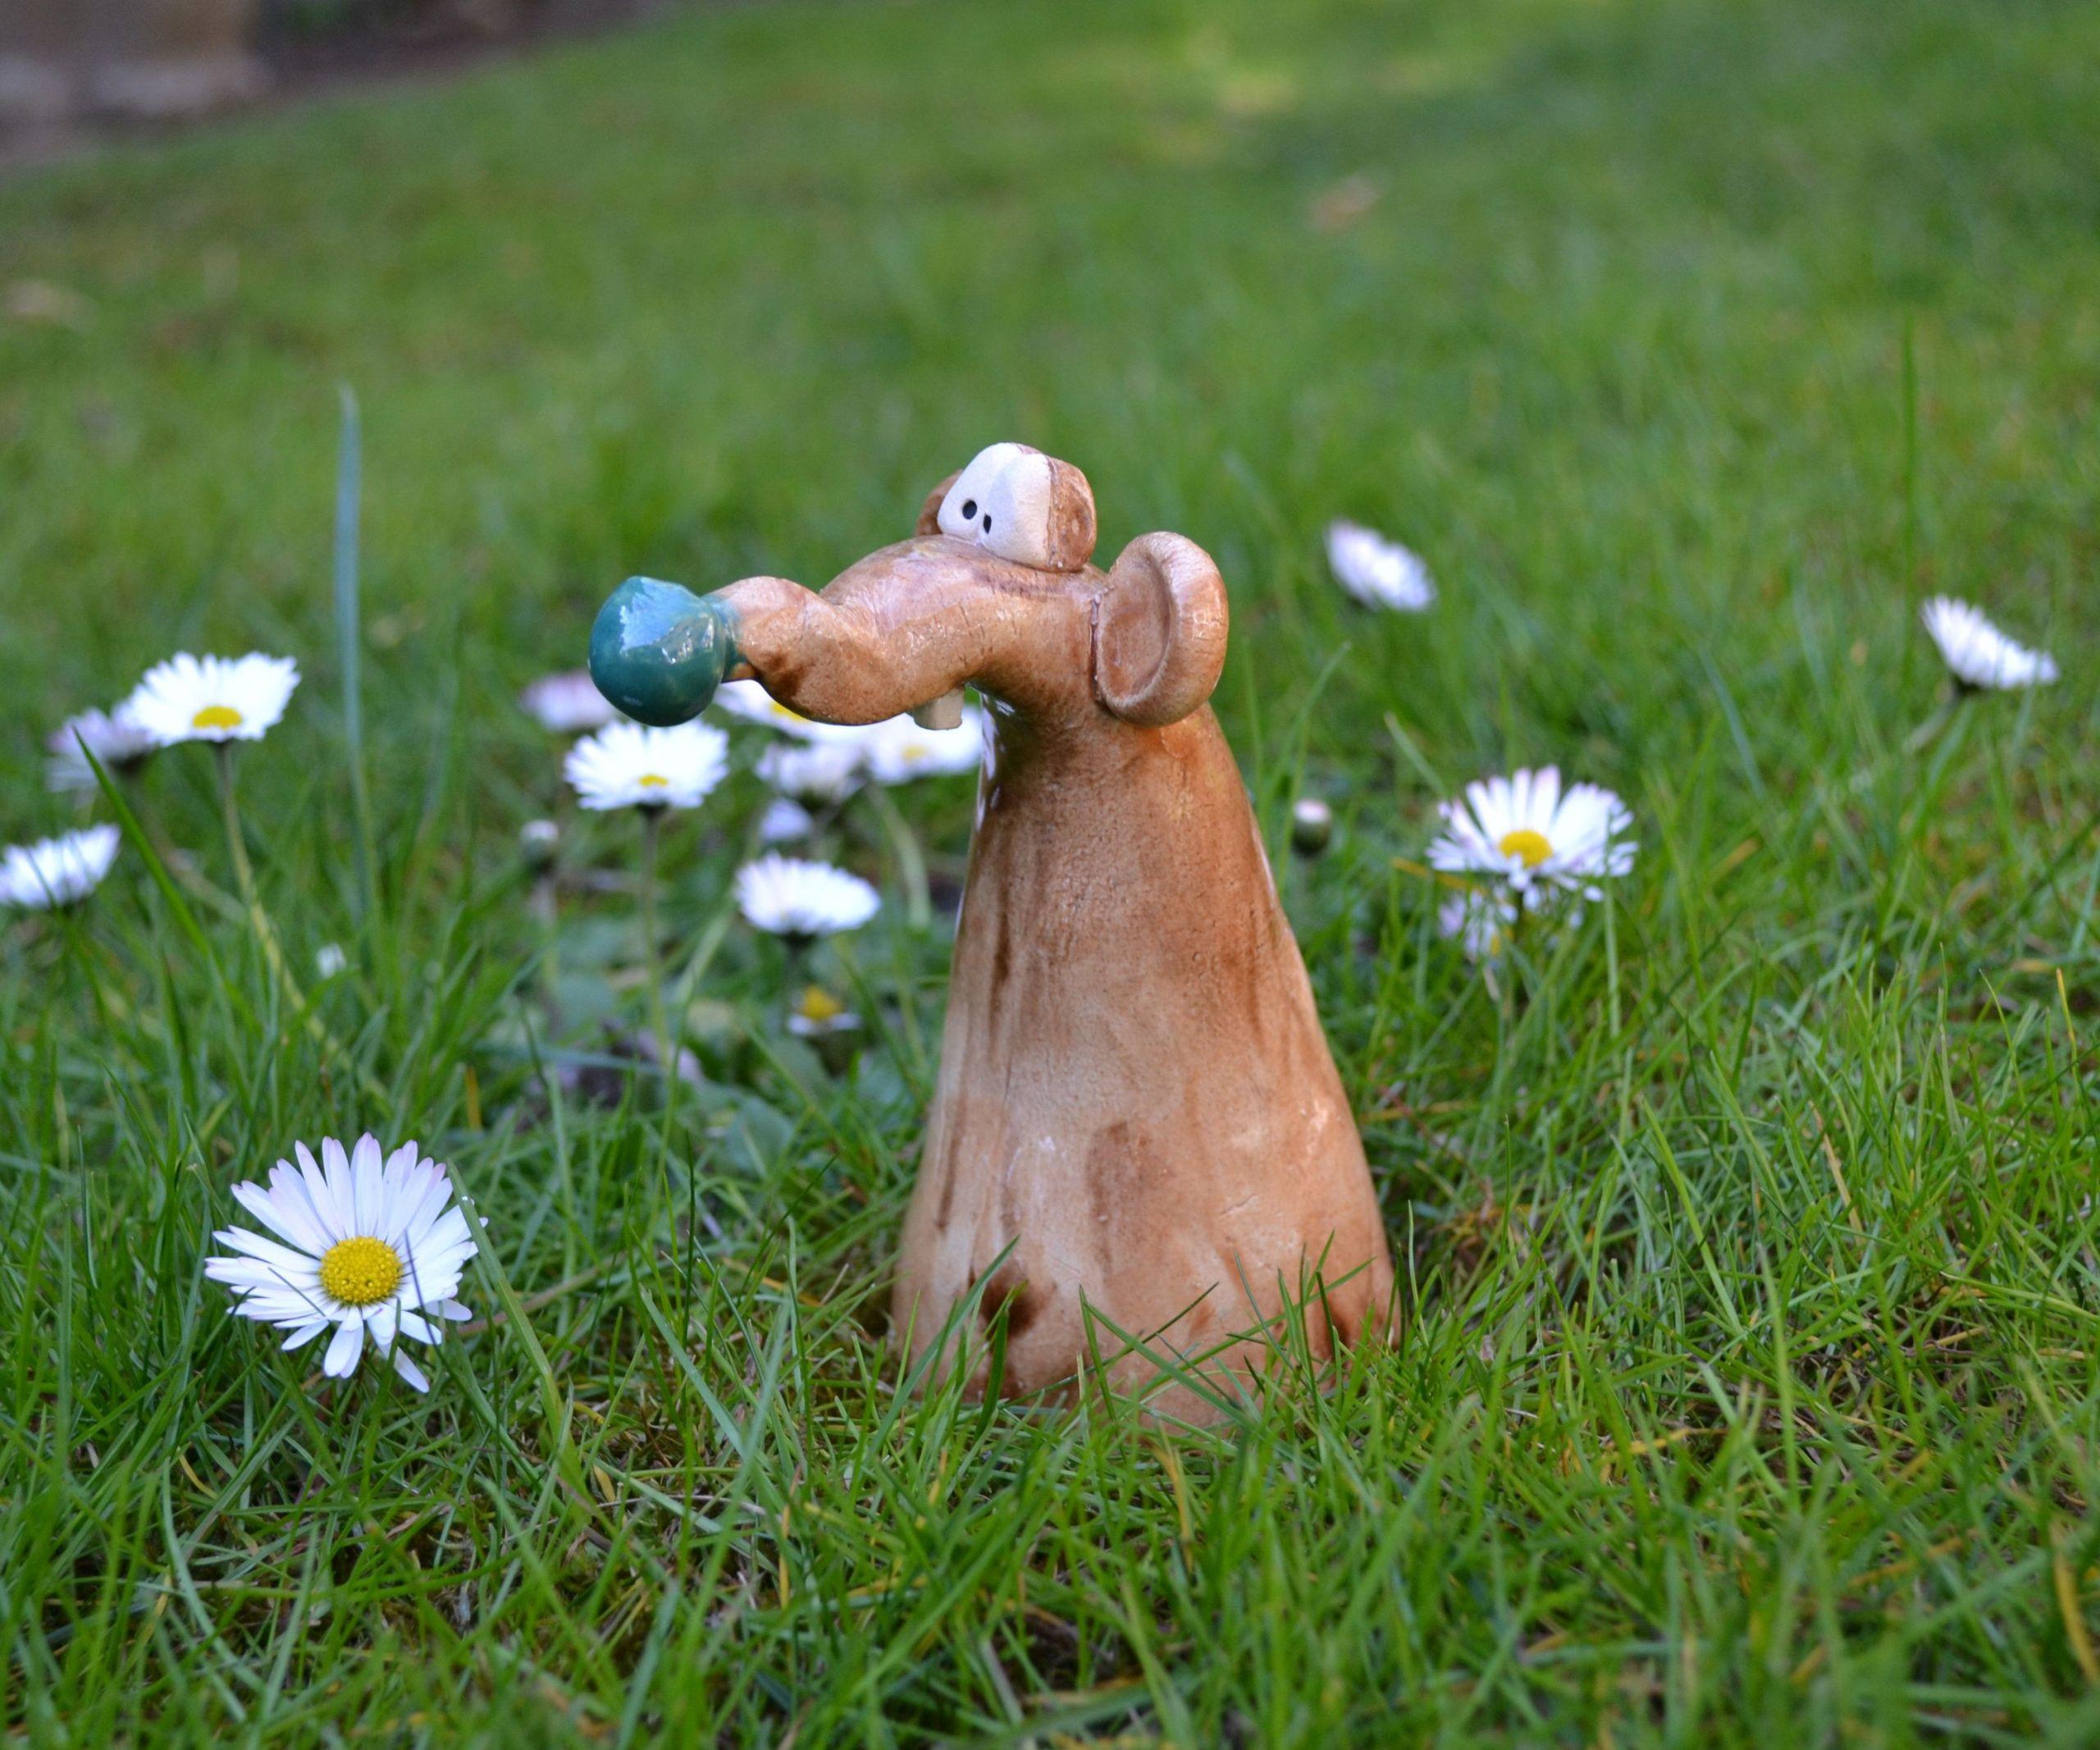 Asiatische Gartendeko Einzigartig Keramik Gartendeko Süße Maus Max